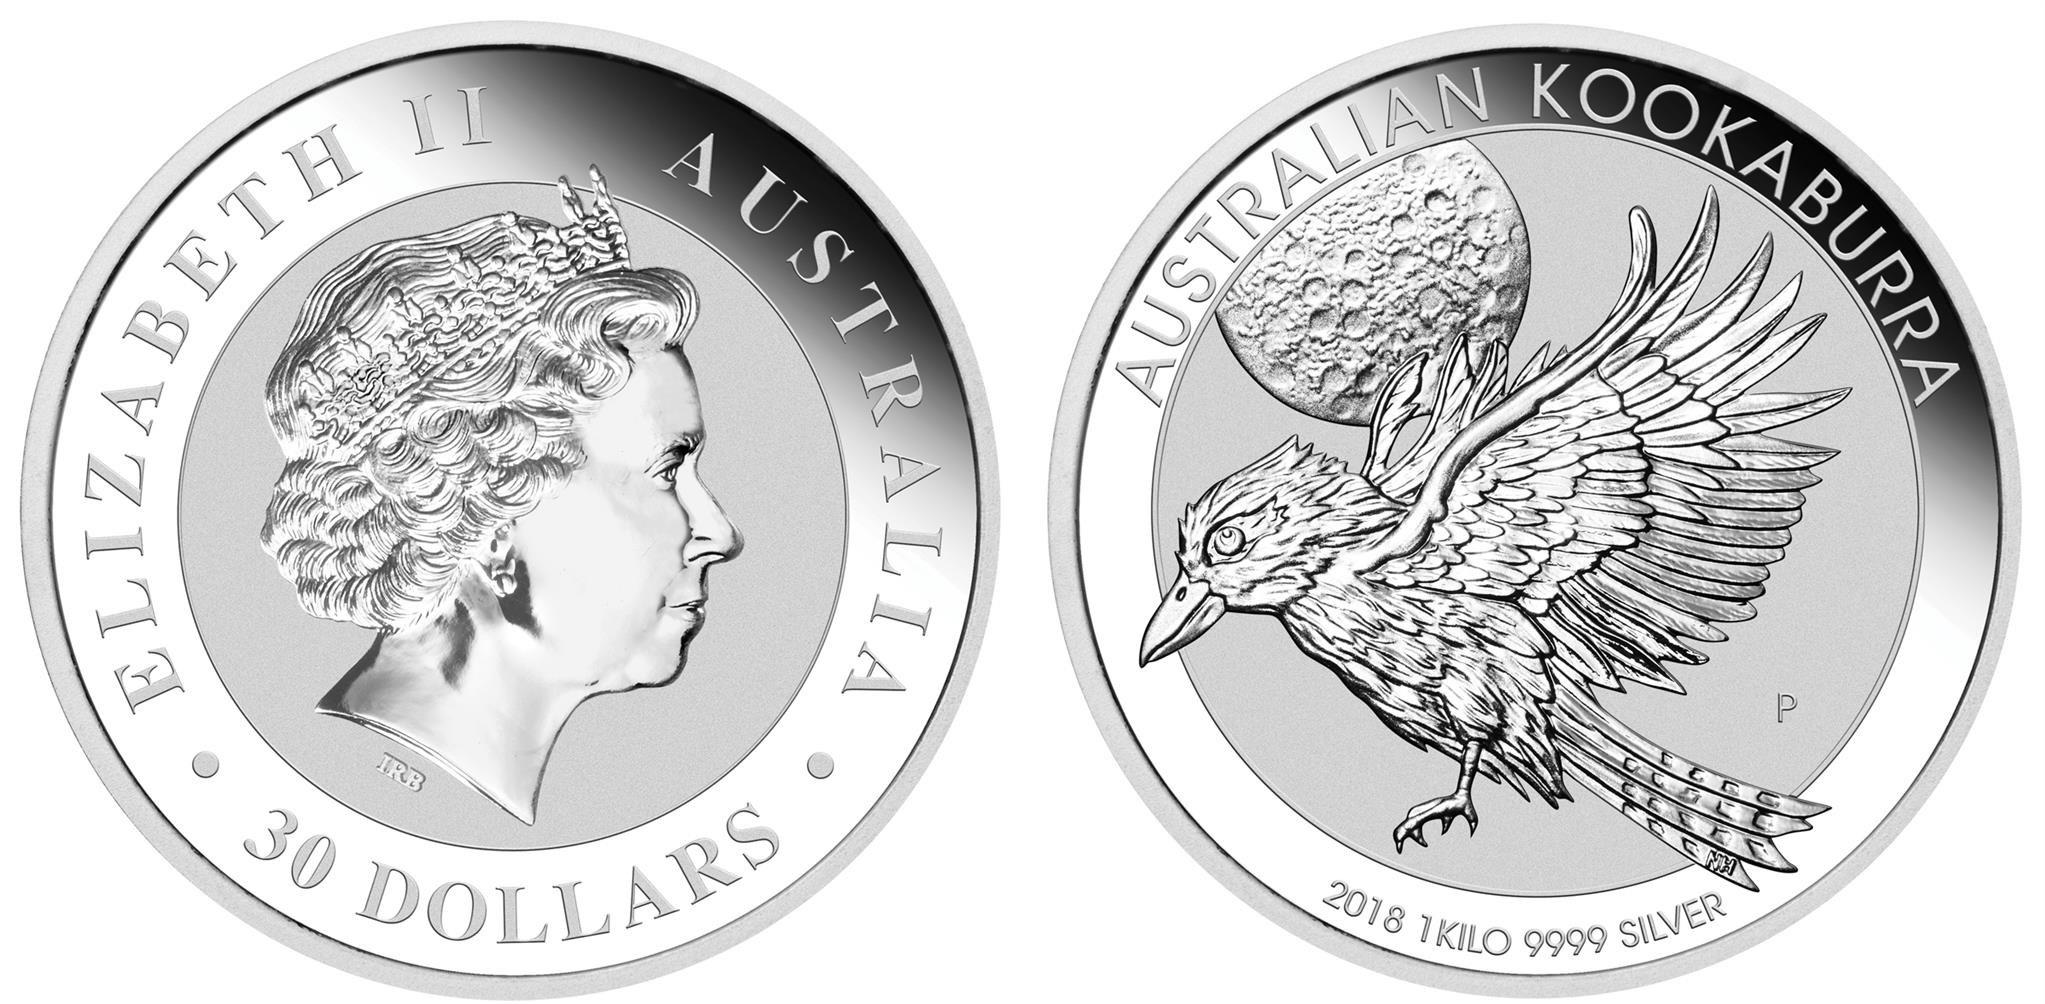 australie 2018 kookaburra kg